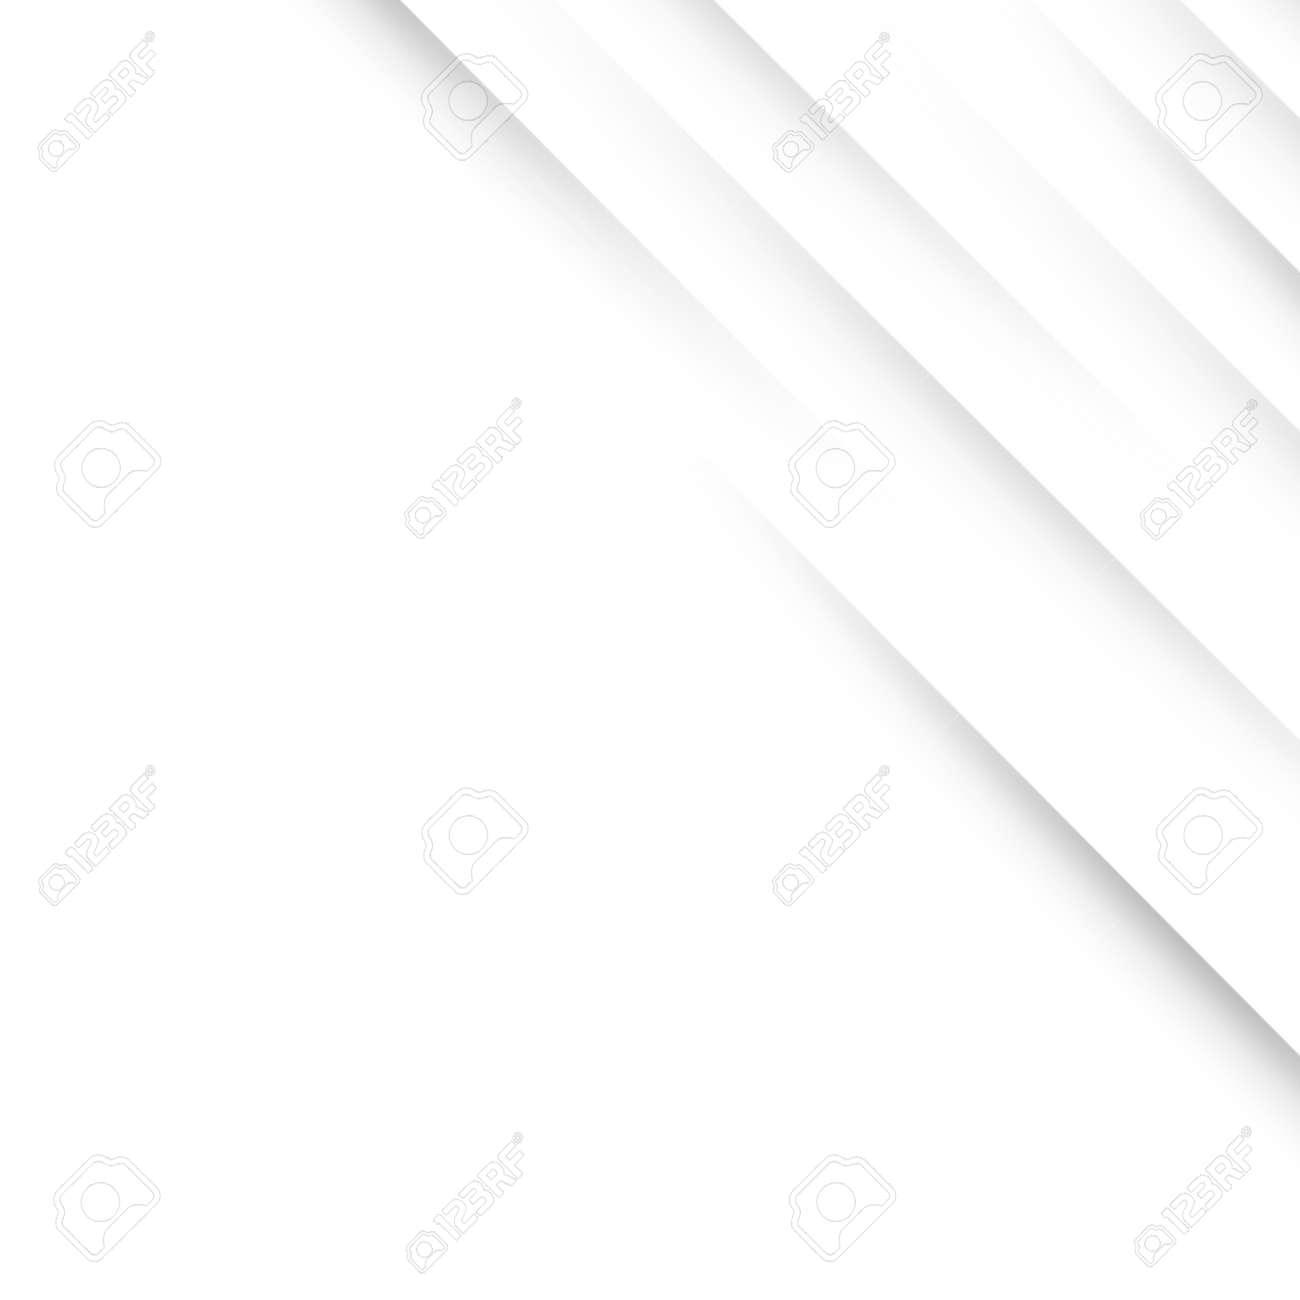 Simple Slanting Shadow Lines Vector Background - Decorative Minimal